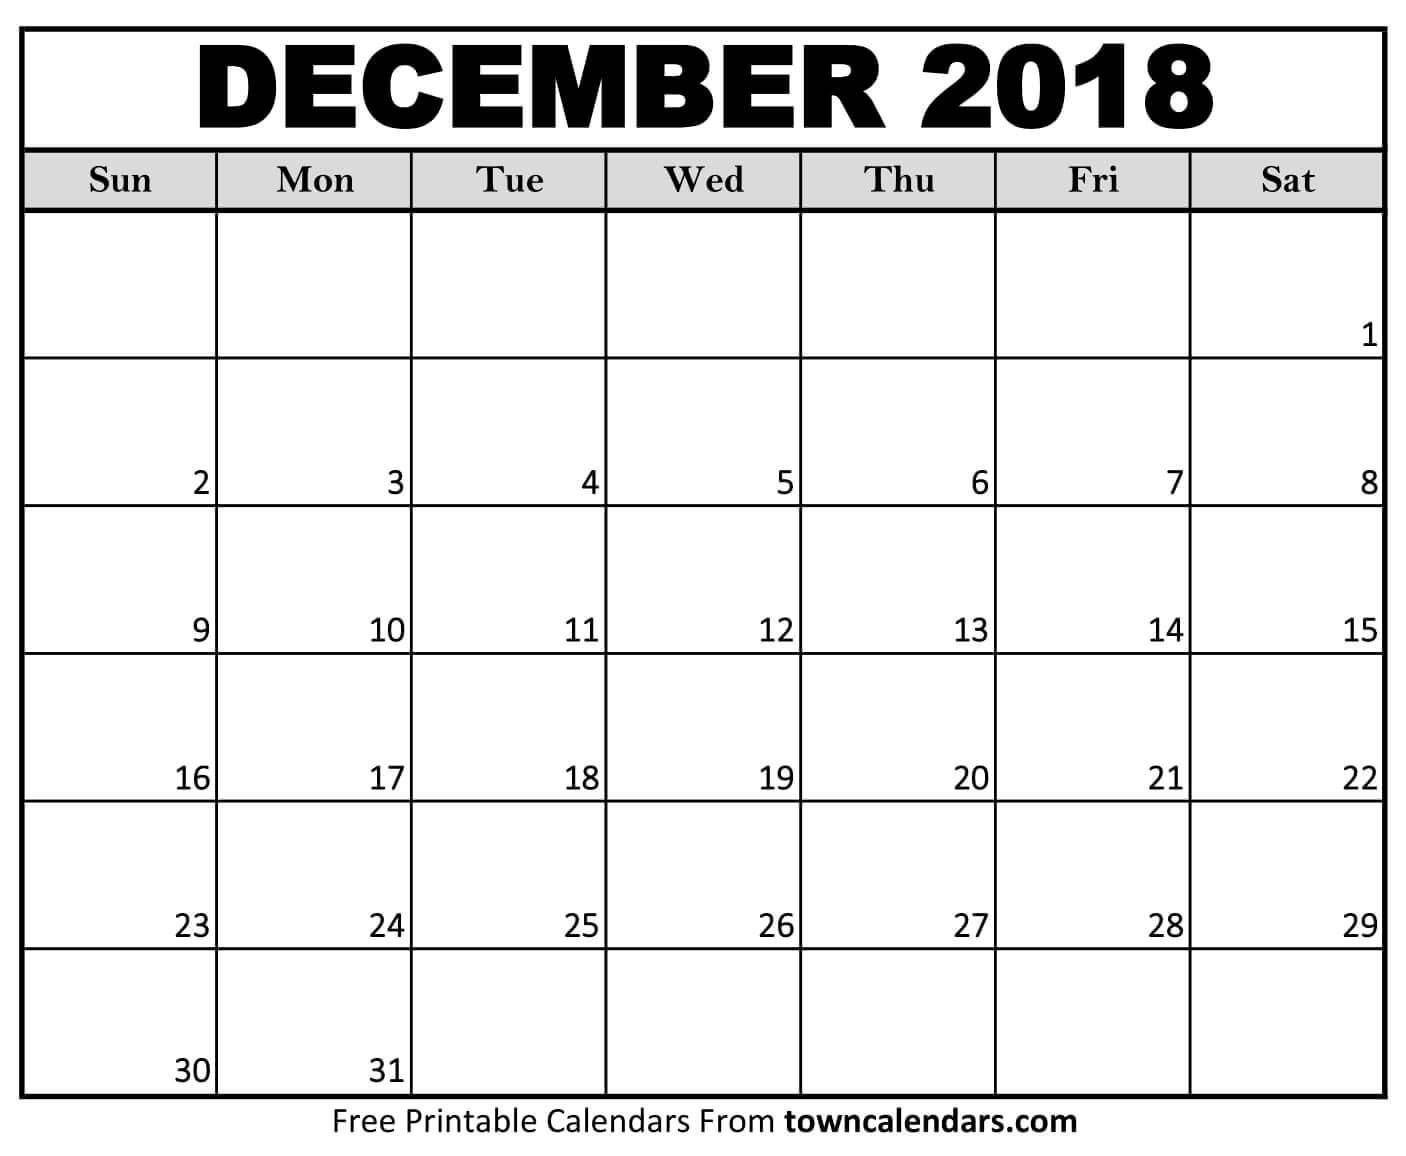 Printable December 2018 Calendar towncalendars